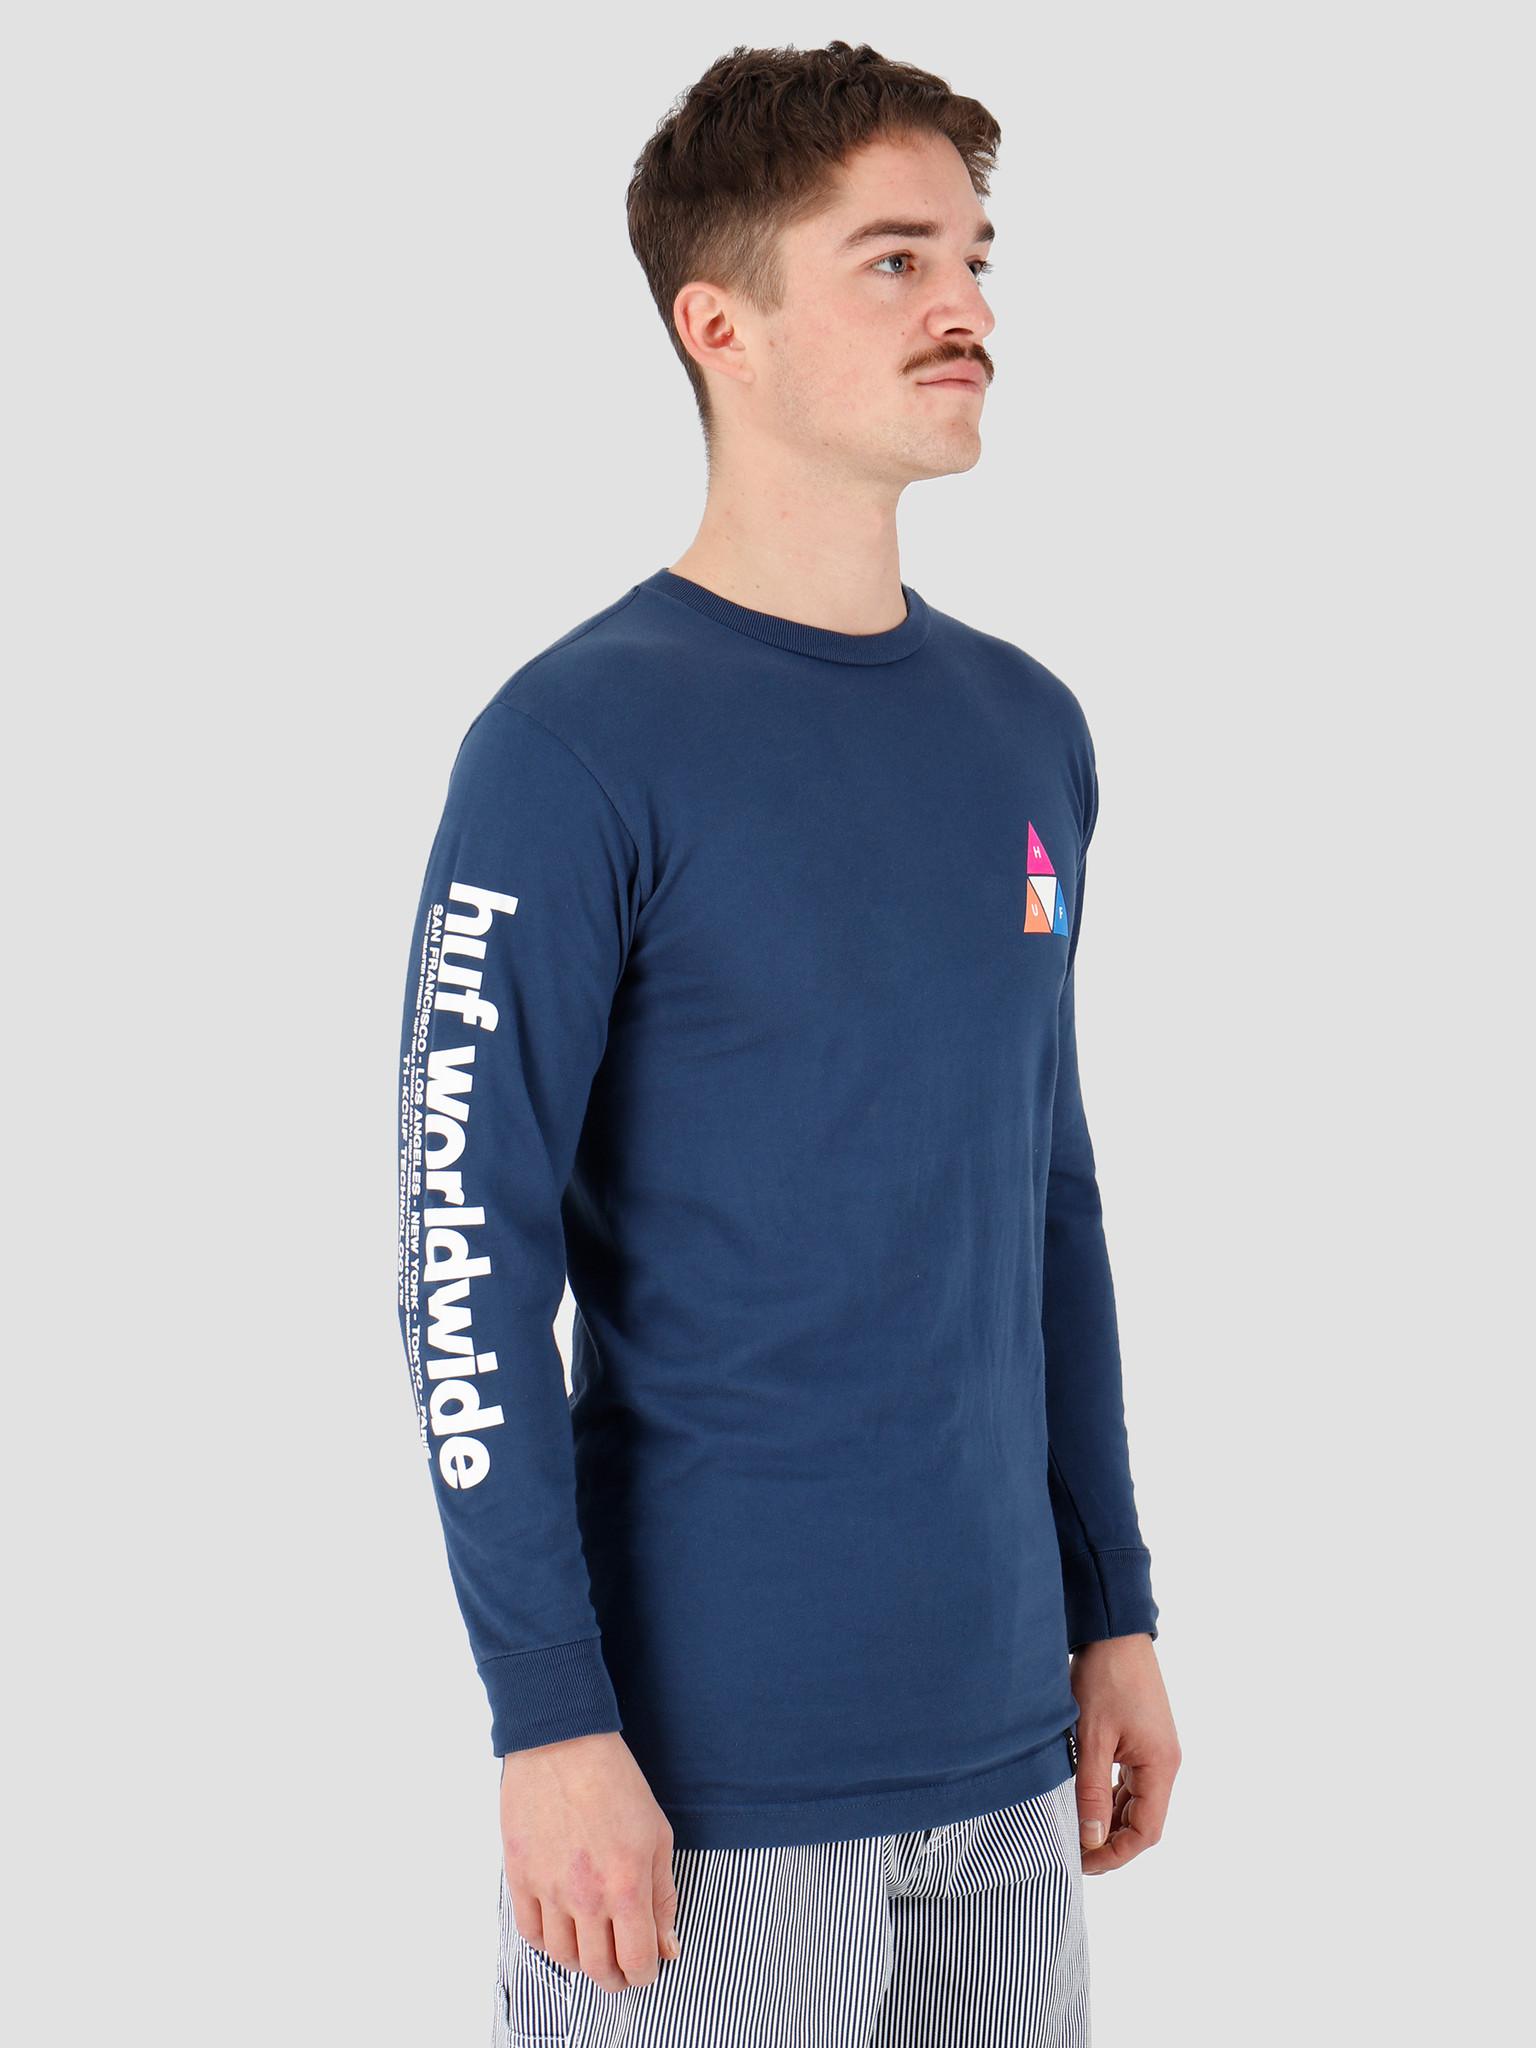 HUF HUF Prism Tt Longsleeve Tee Insignia Blue Ts00938Iablu